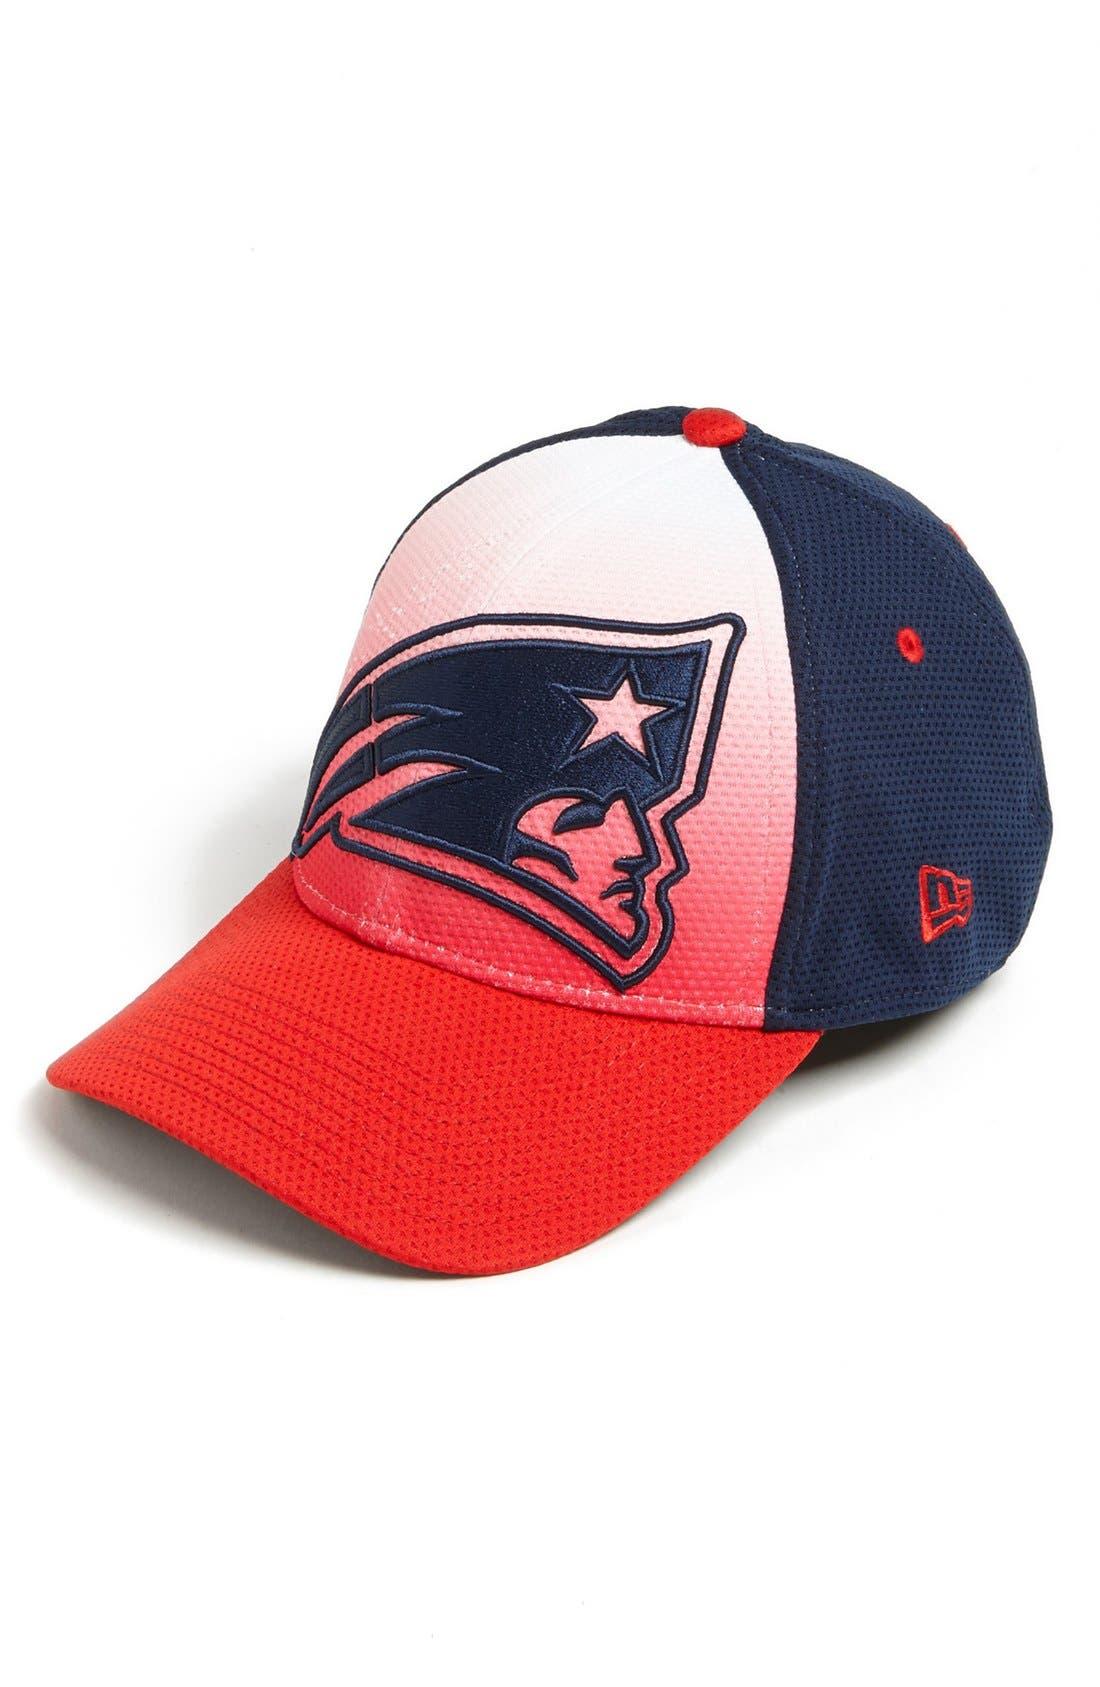 Alternate Image 1 Selected - New Era Cap 'Gradation - New England Patriots' Baseball Cap